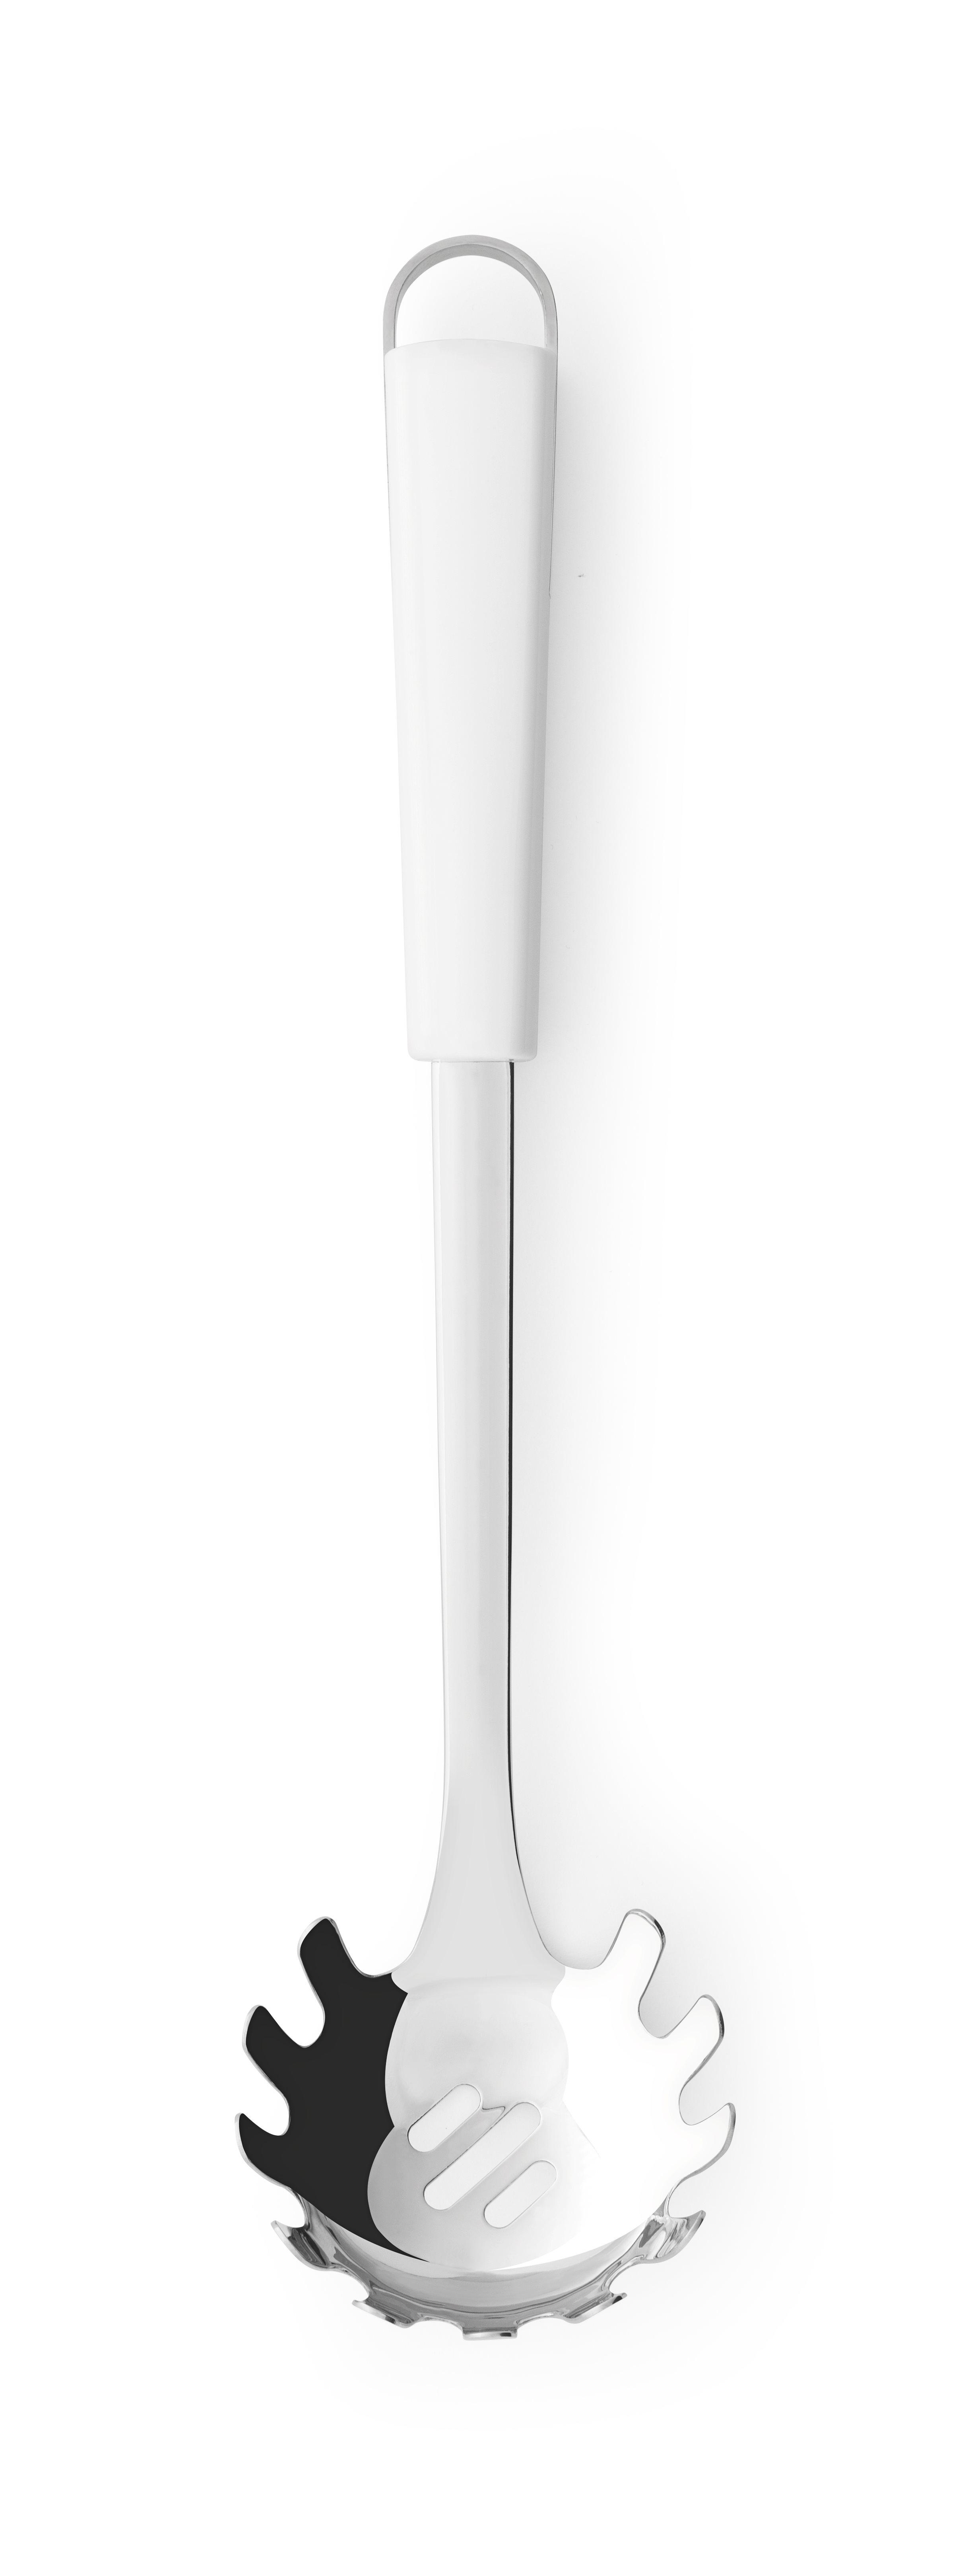 BRABANTIA Κουτάλα Ζυμαρικών Ανοξείδωτη με Λευκή Λαβή ESSENTIAL LINE - 080.4005/82